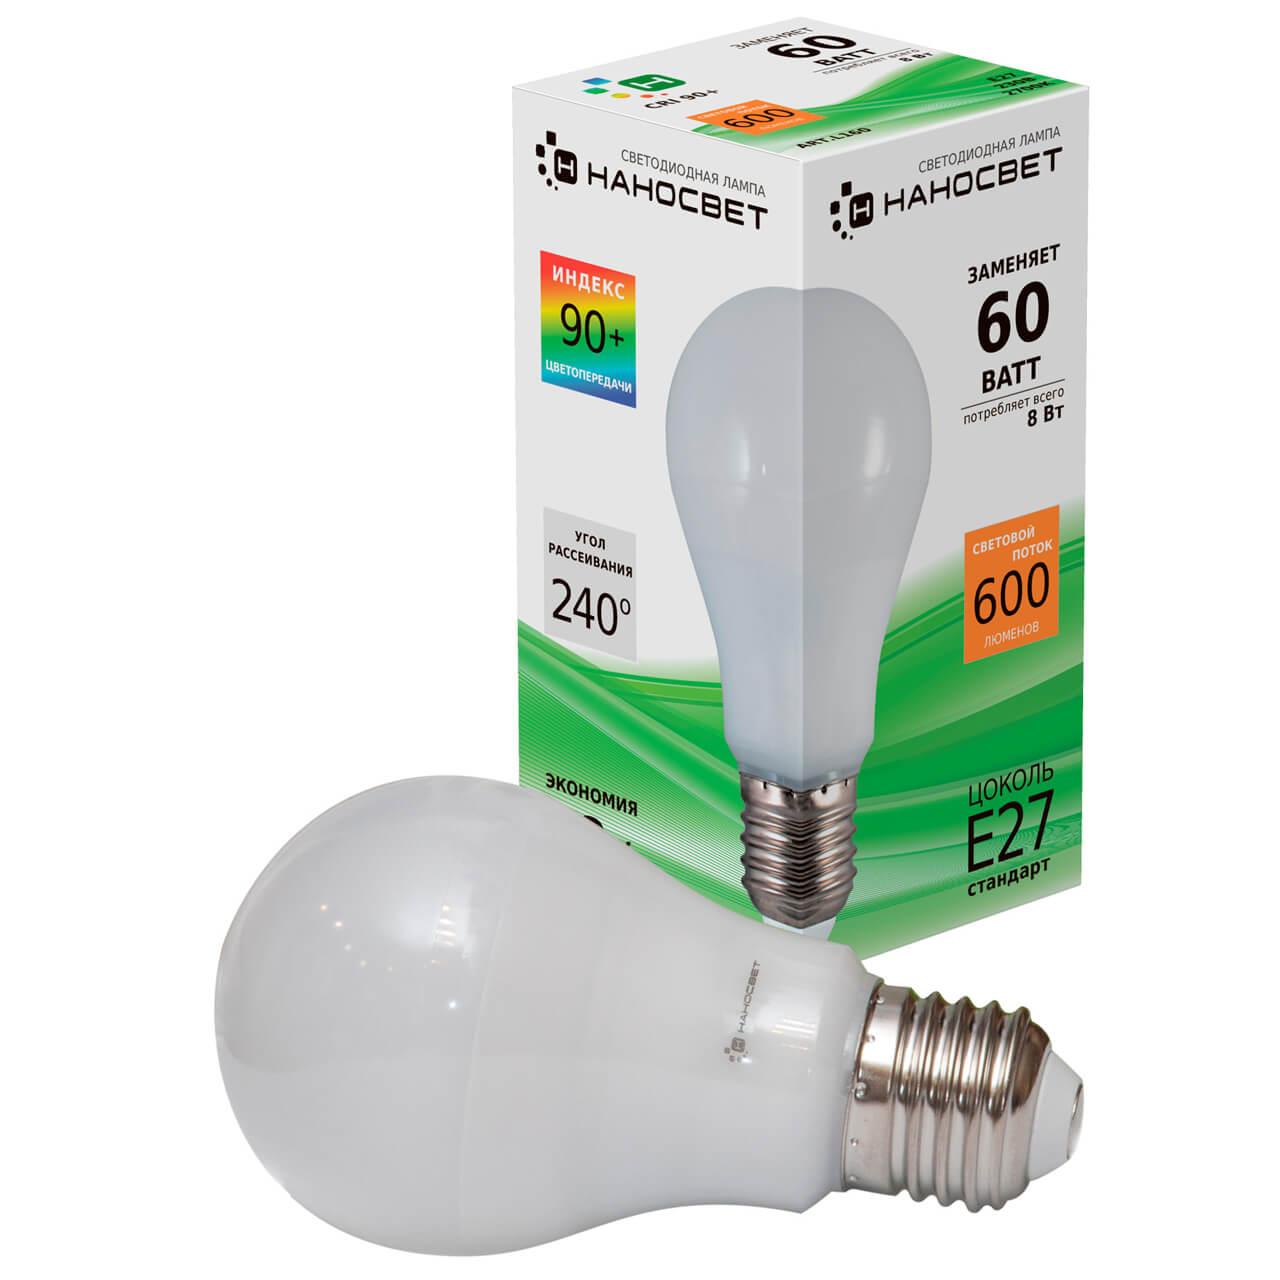 Лампа светодиодная Наносвет E27 8W 2700K матовая LE-GLS-8/E27/827 L160 лампа светодиодная e27 6w 2700k свеча матовая le cd 6 e27 827 l252